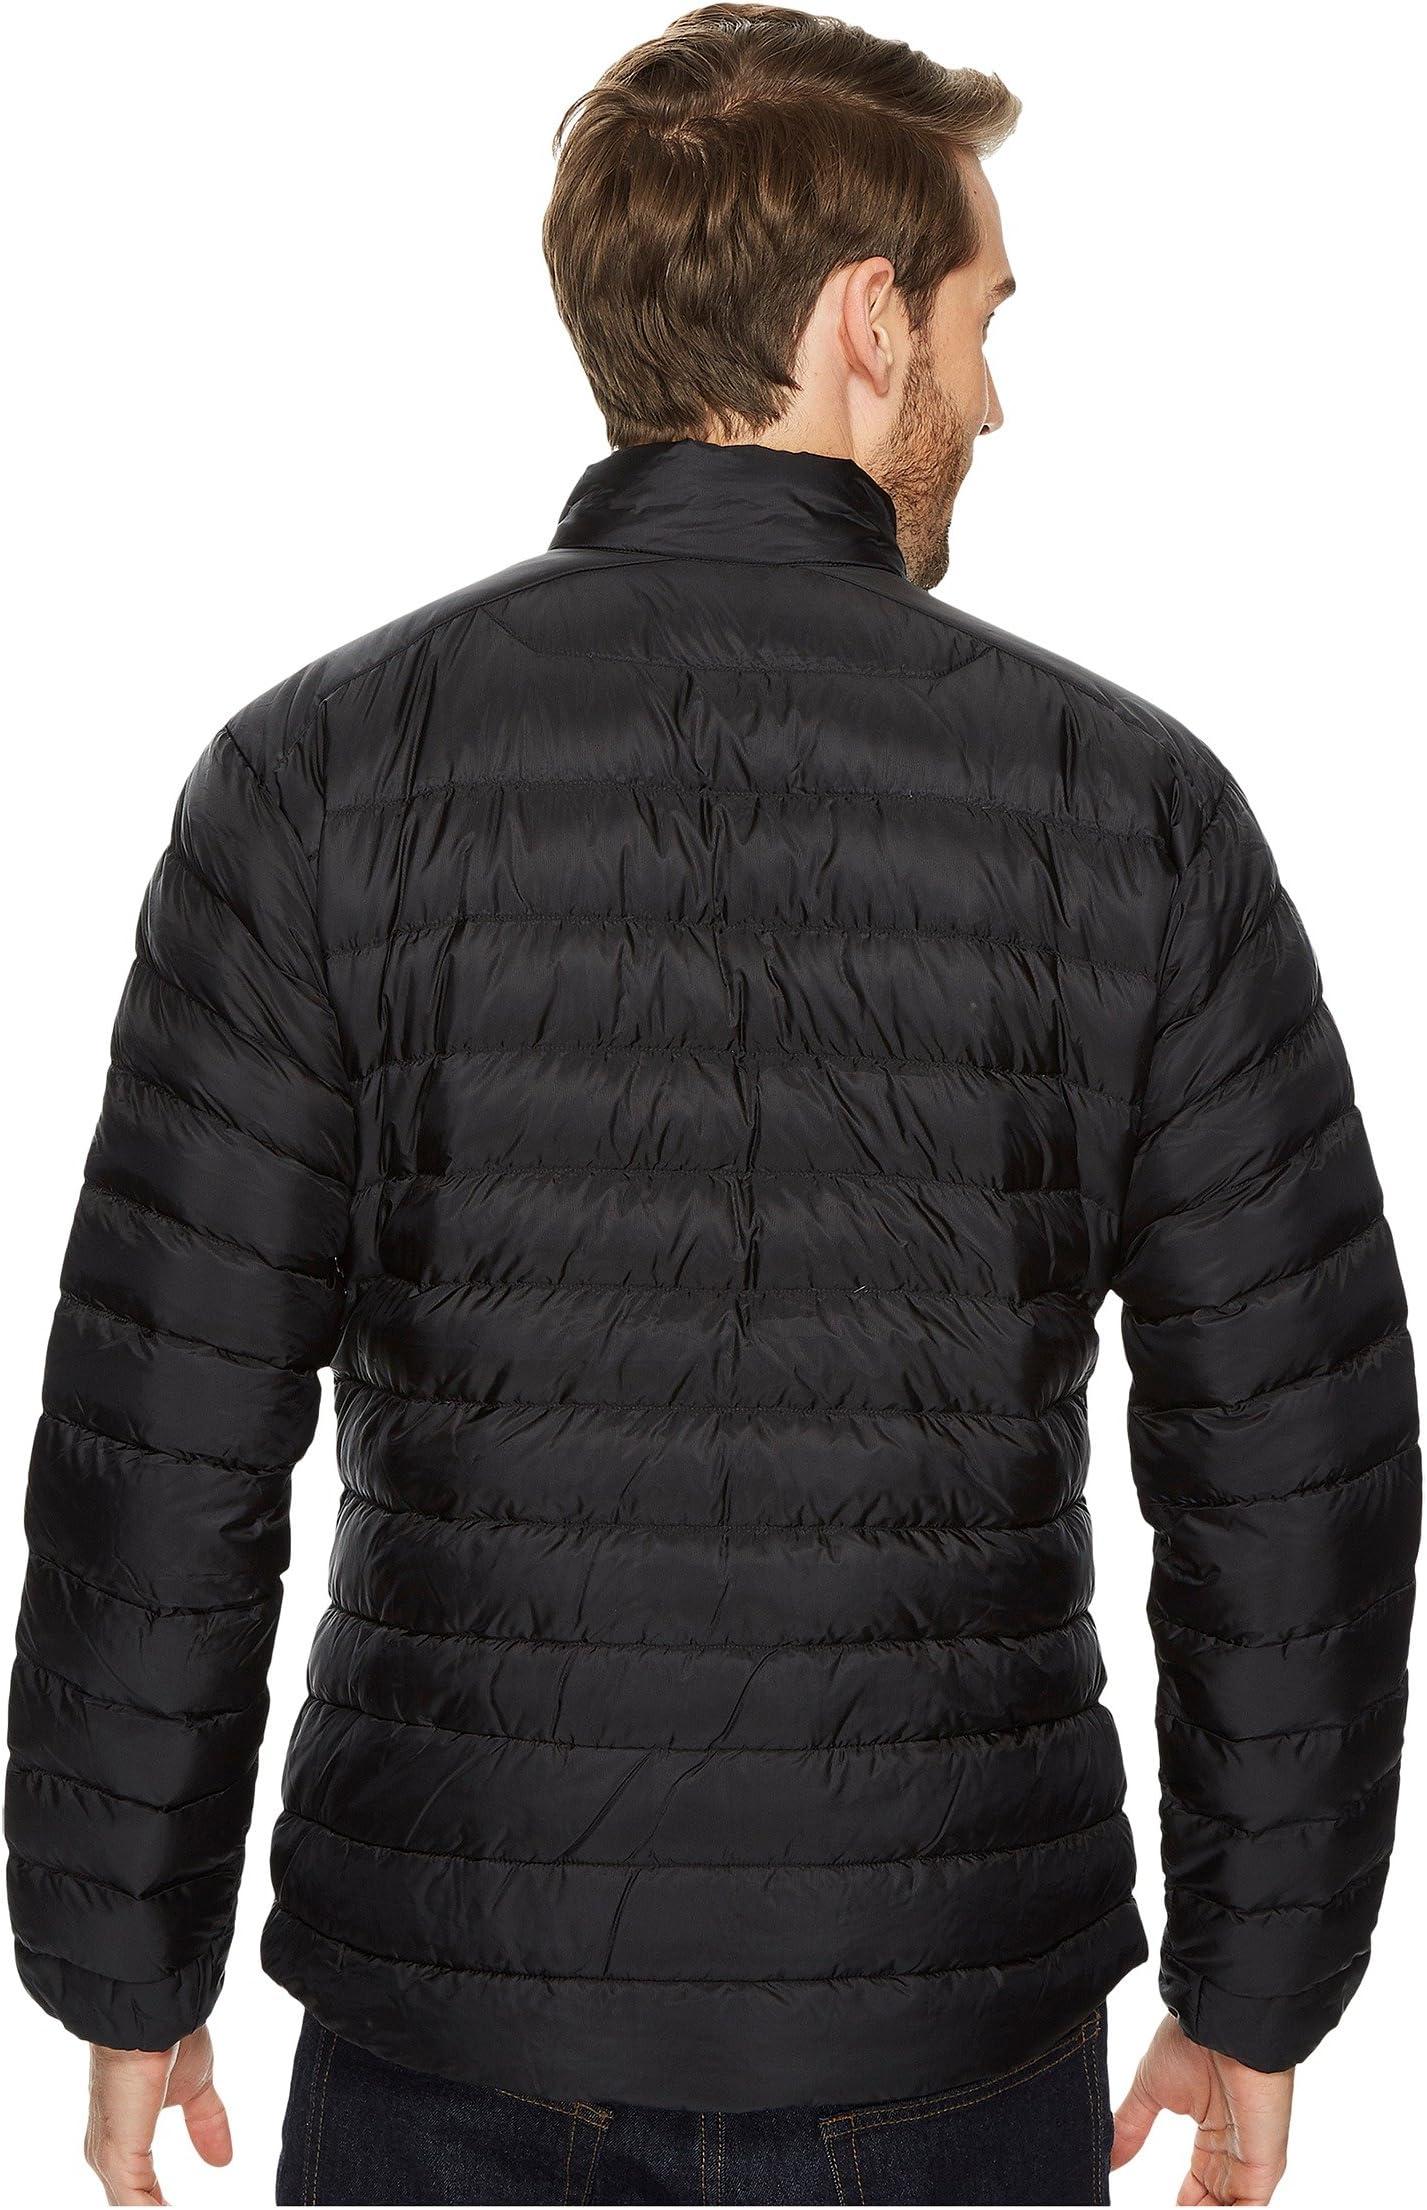 Arc'teryx Cerium LT Jacket pN197